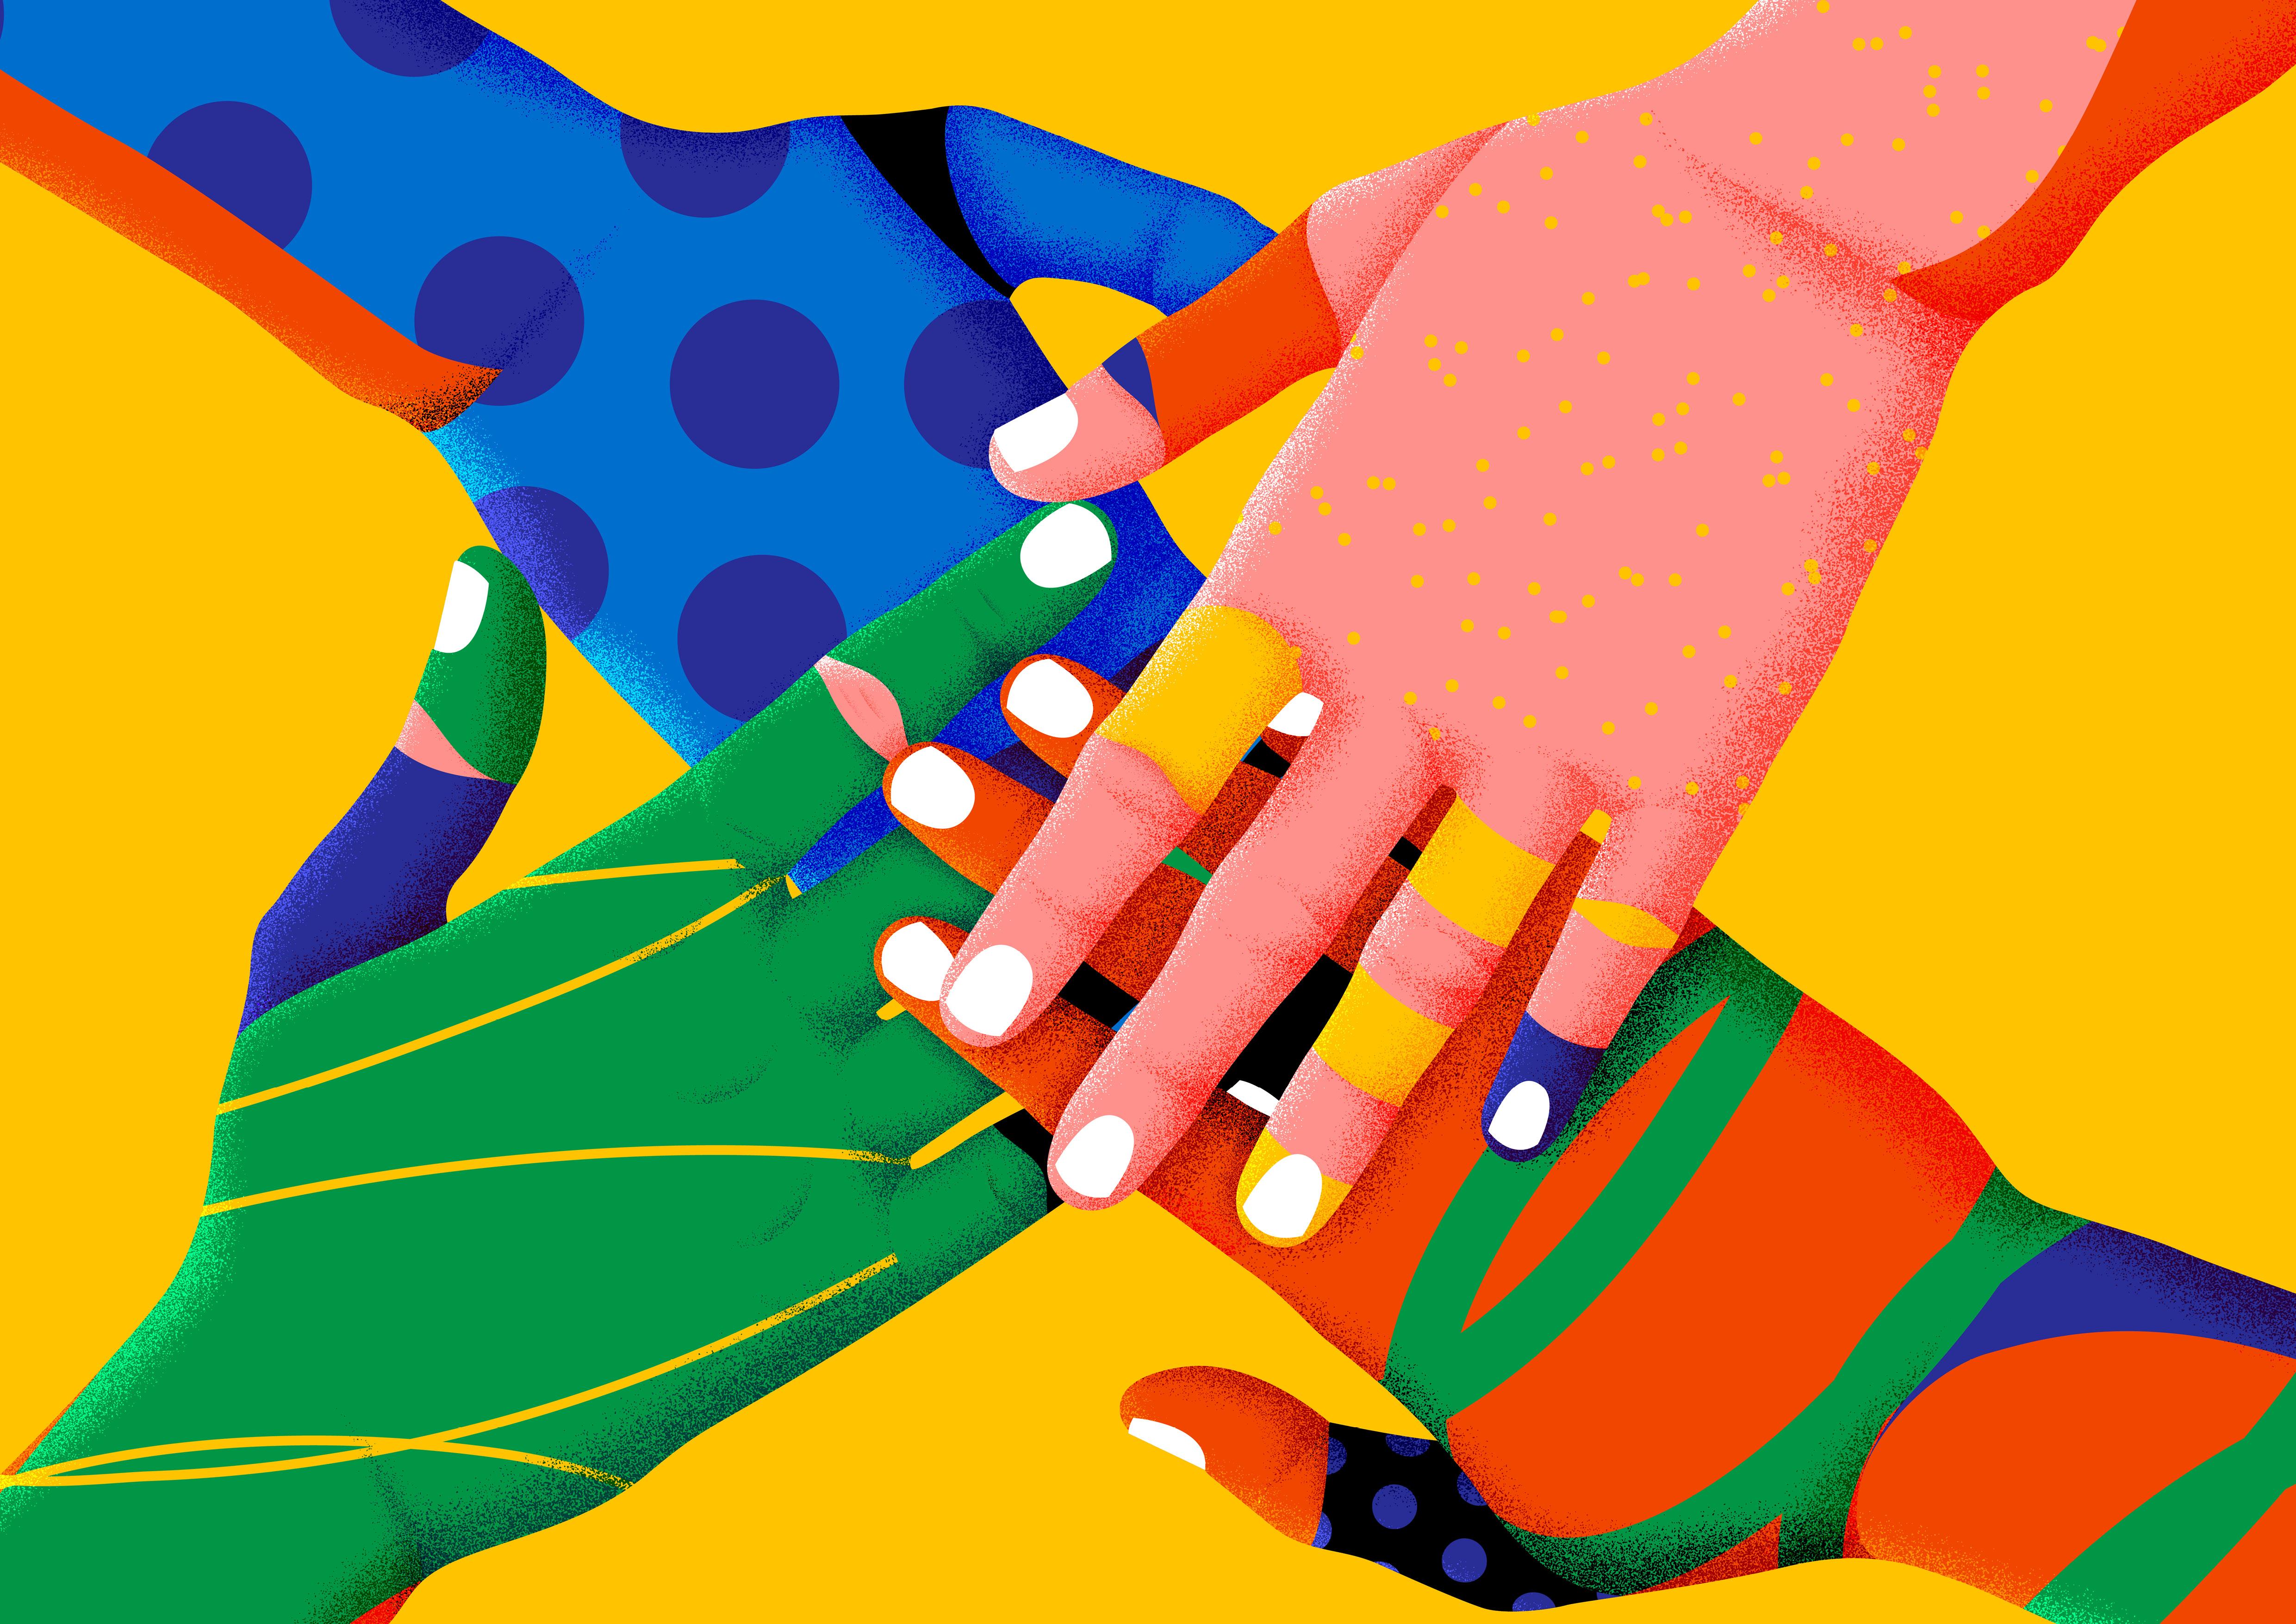 Karan Singh Illustrates Key Visuals for Southeast Asian Games 2019